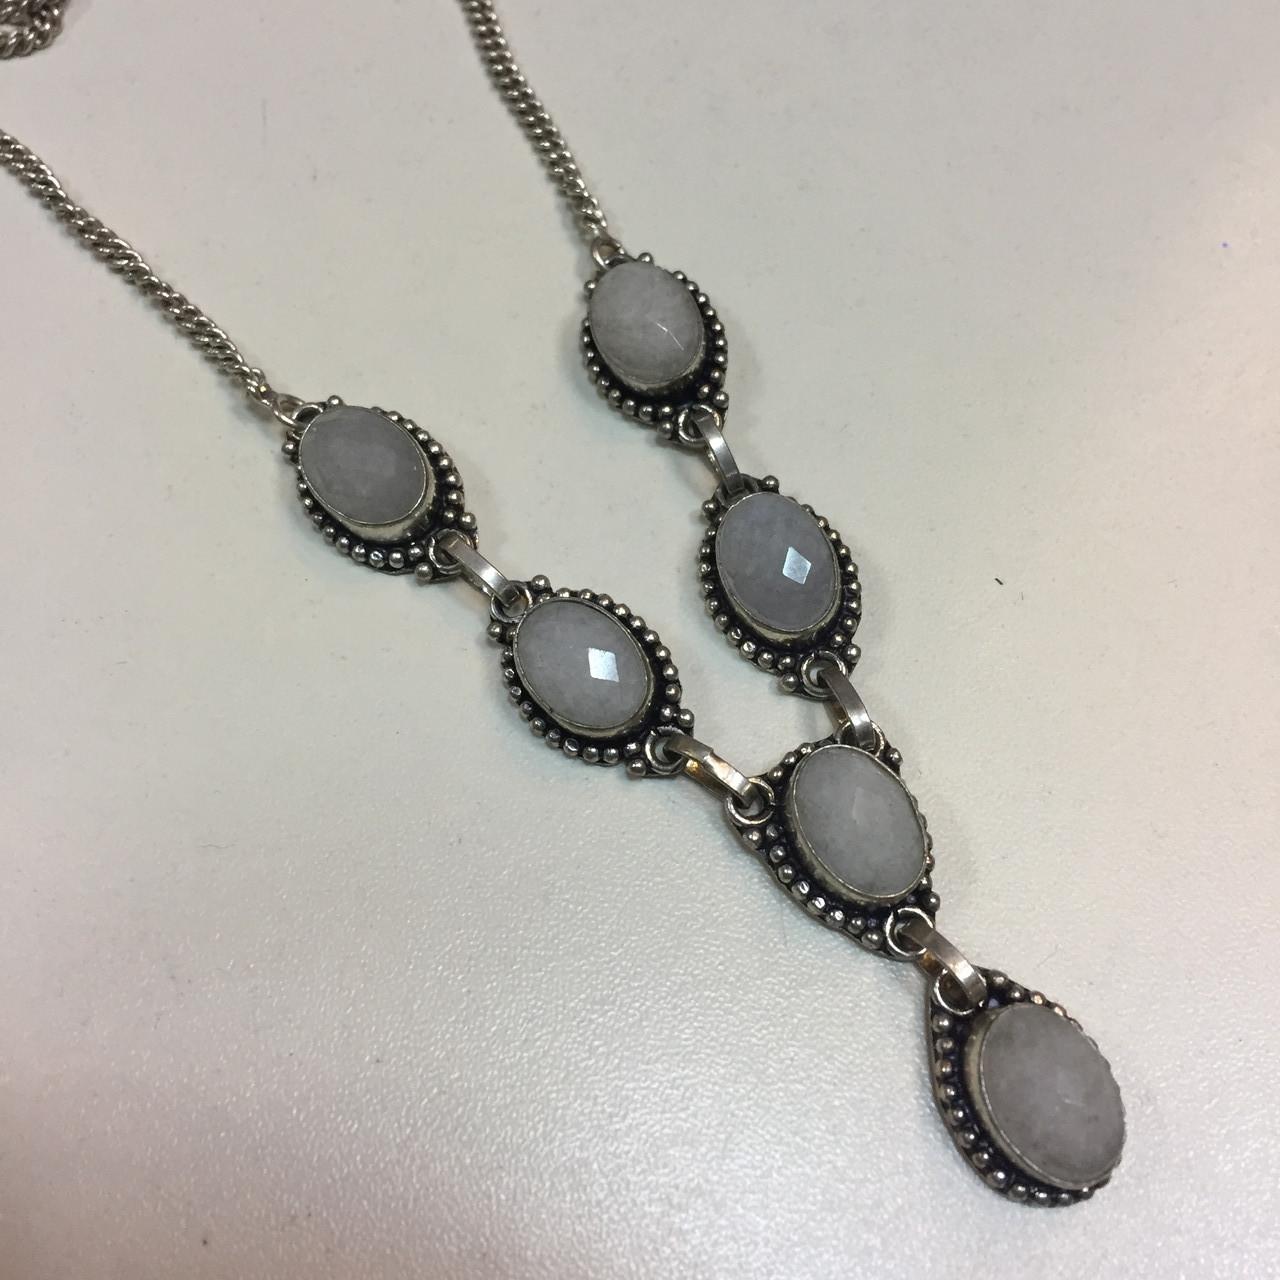 Кварц ожерелье с кварцем натуральный кварц Индия